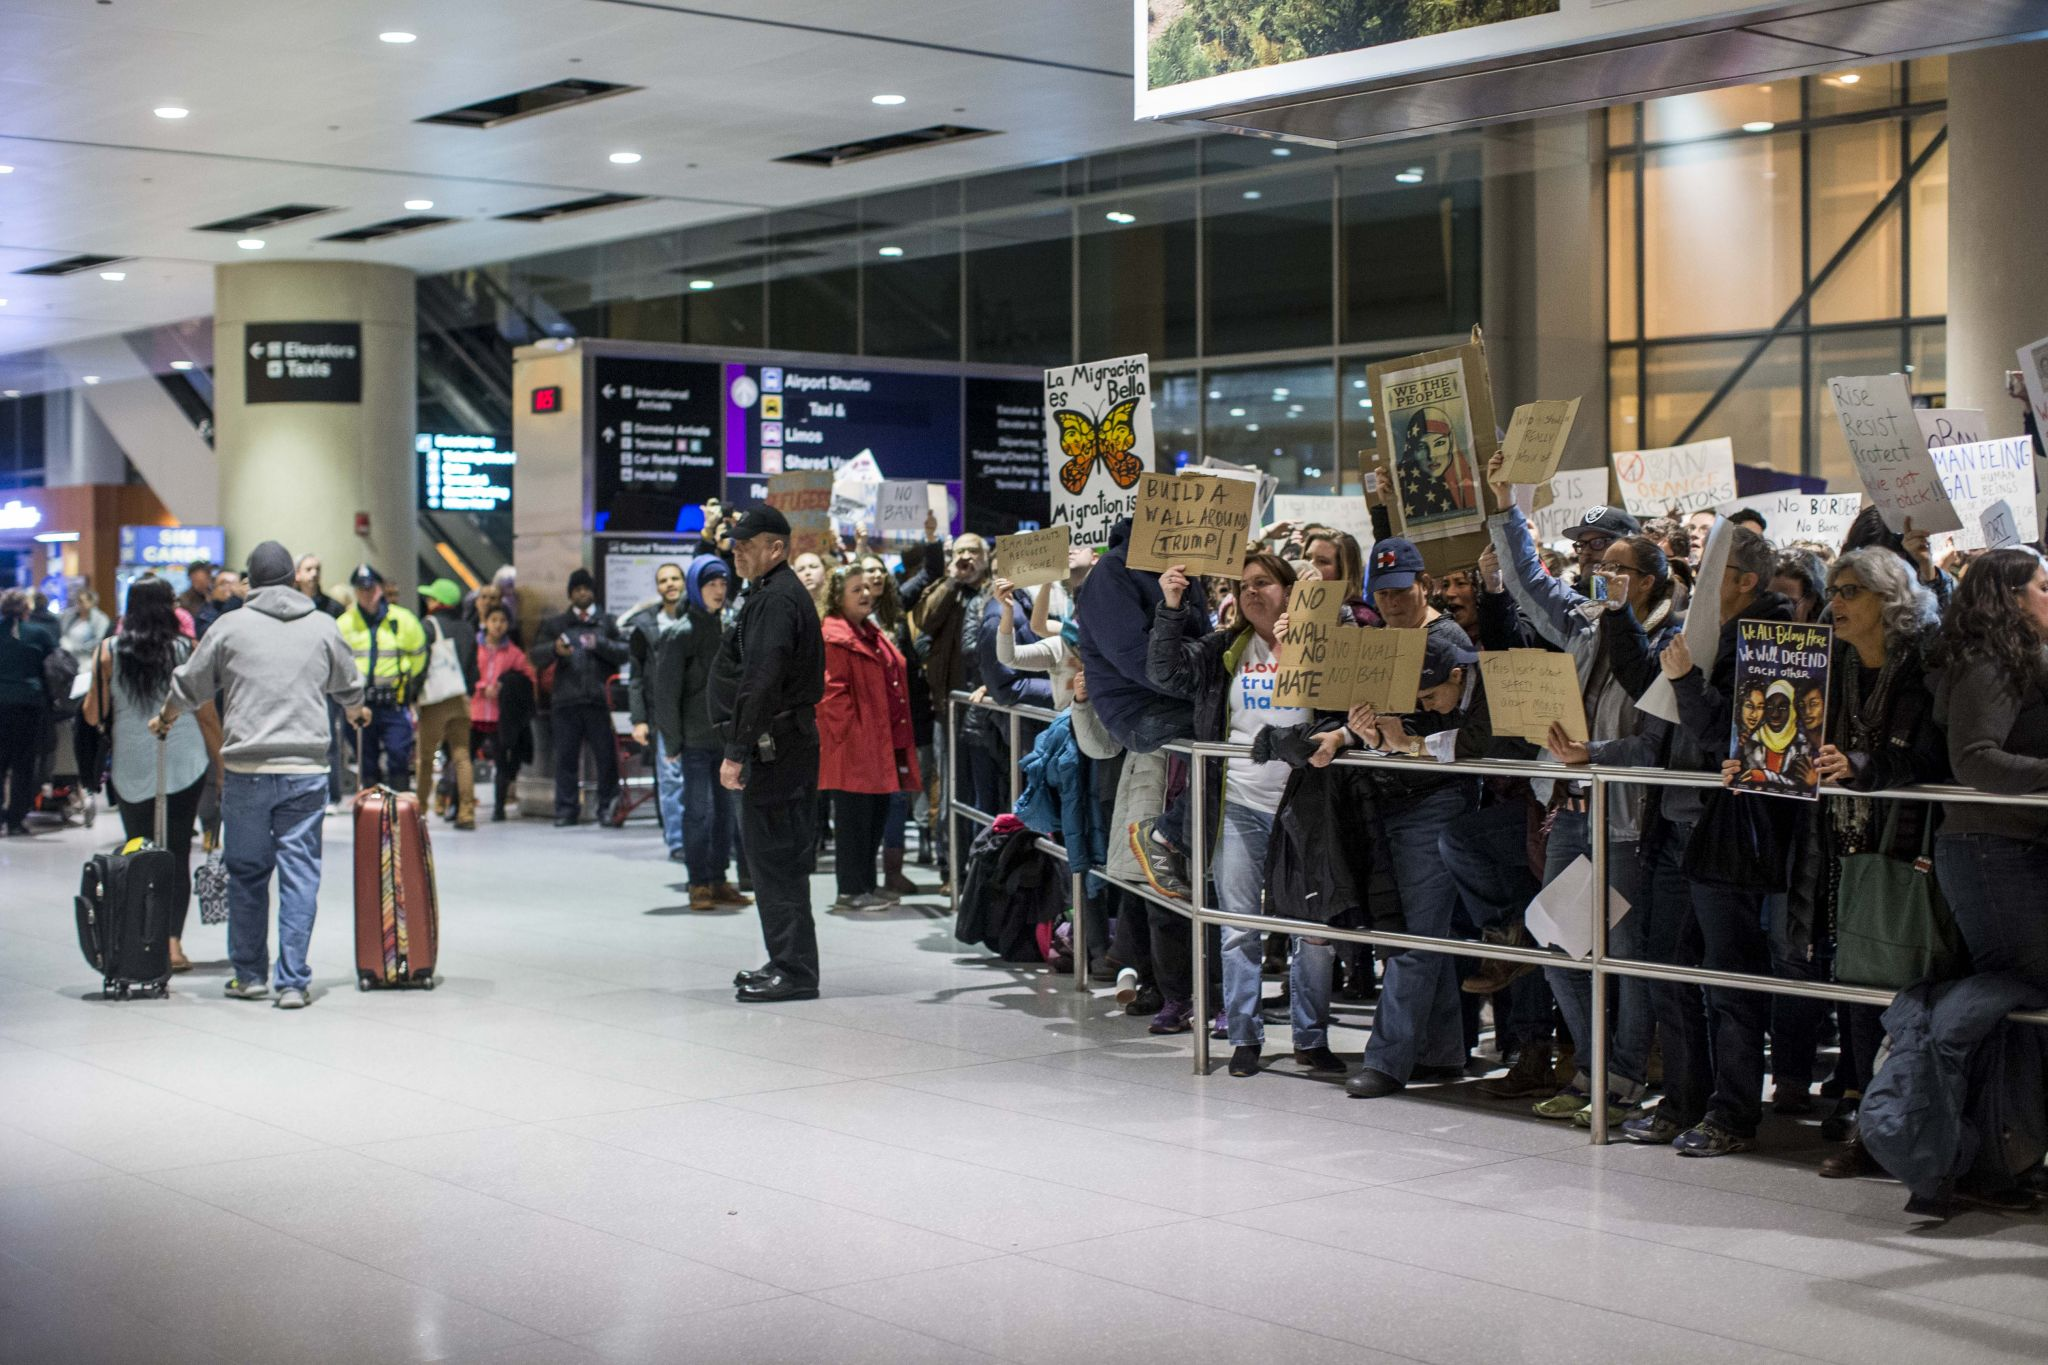 Trump lashes out at federal judge who temporarily blocked travel ban